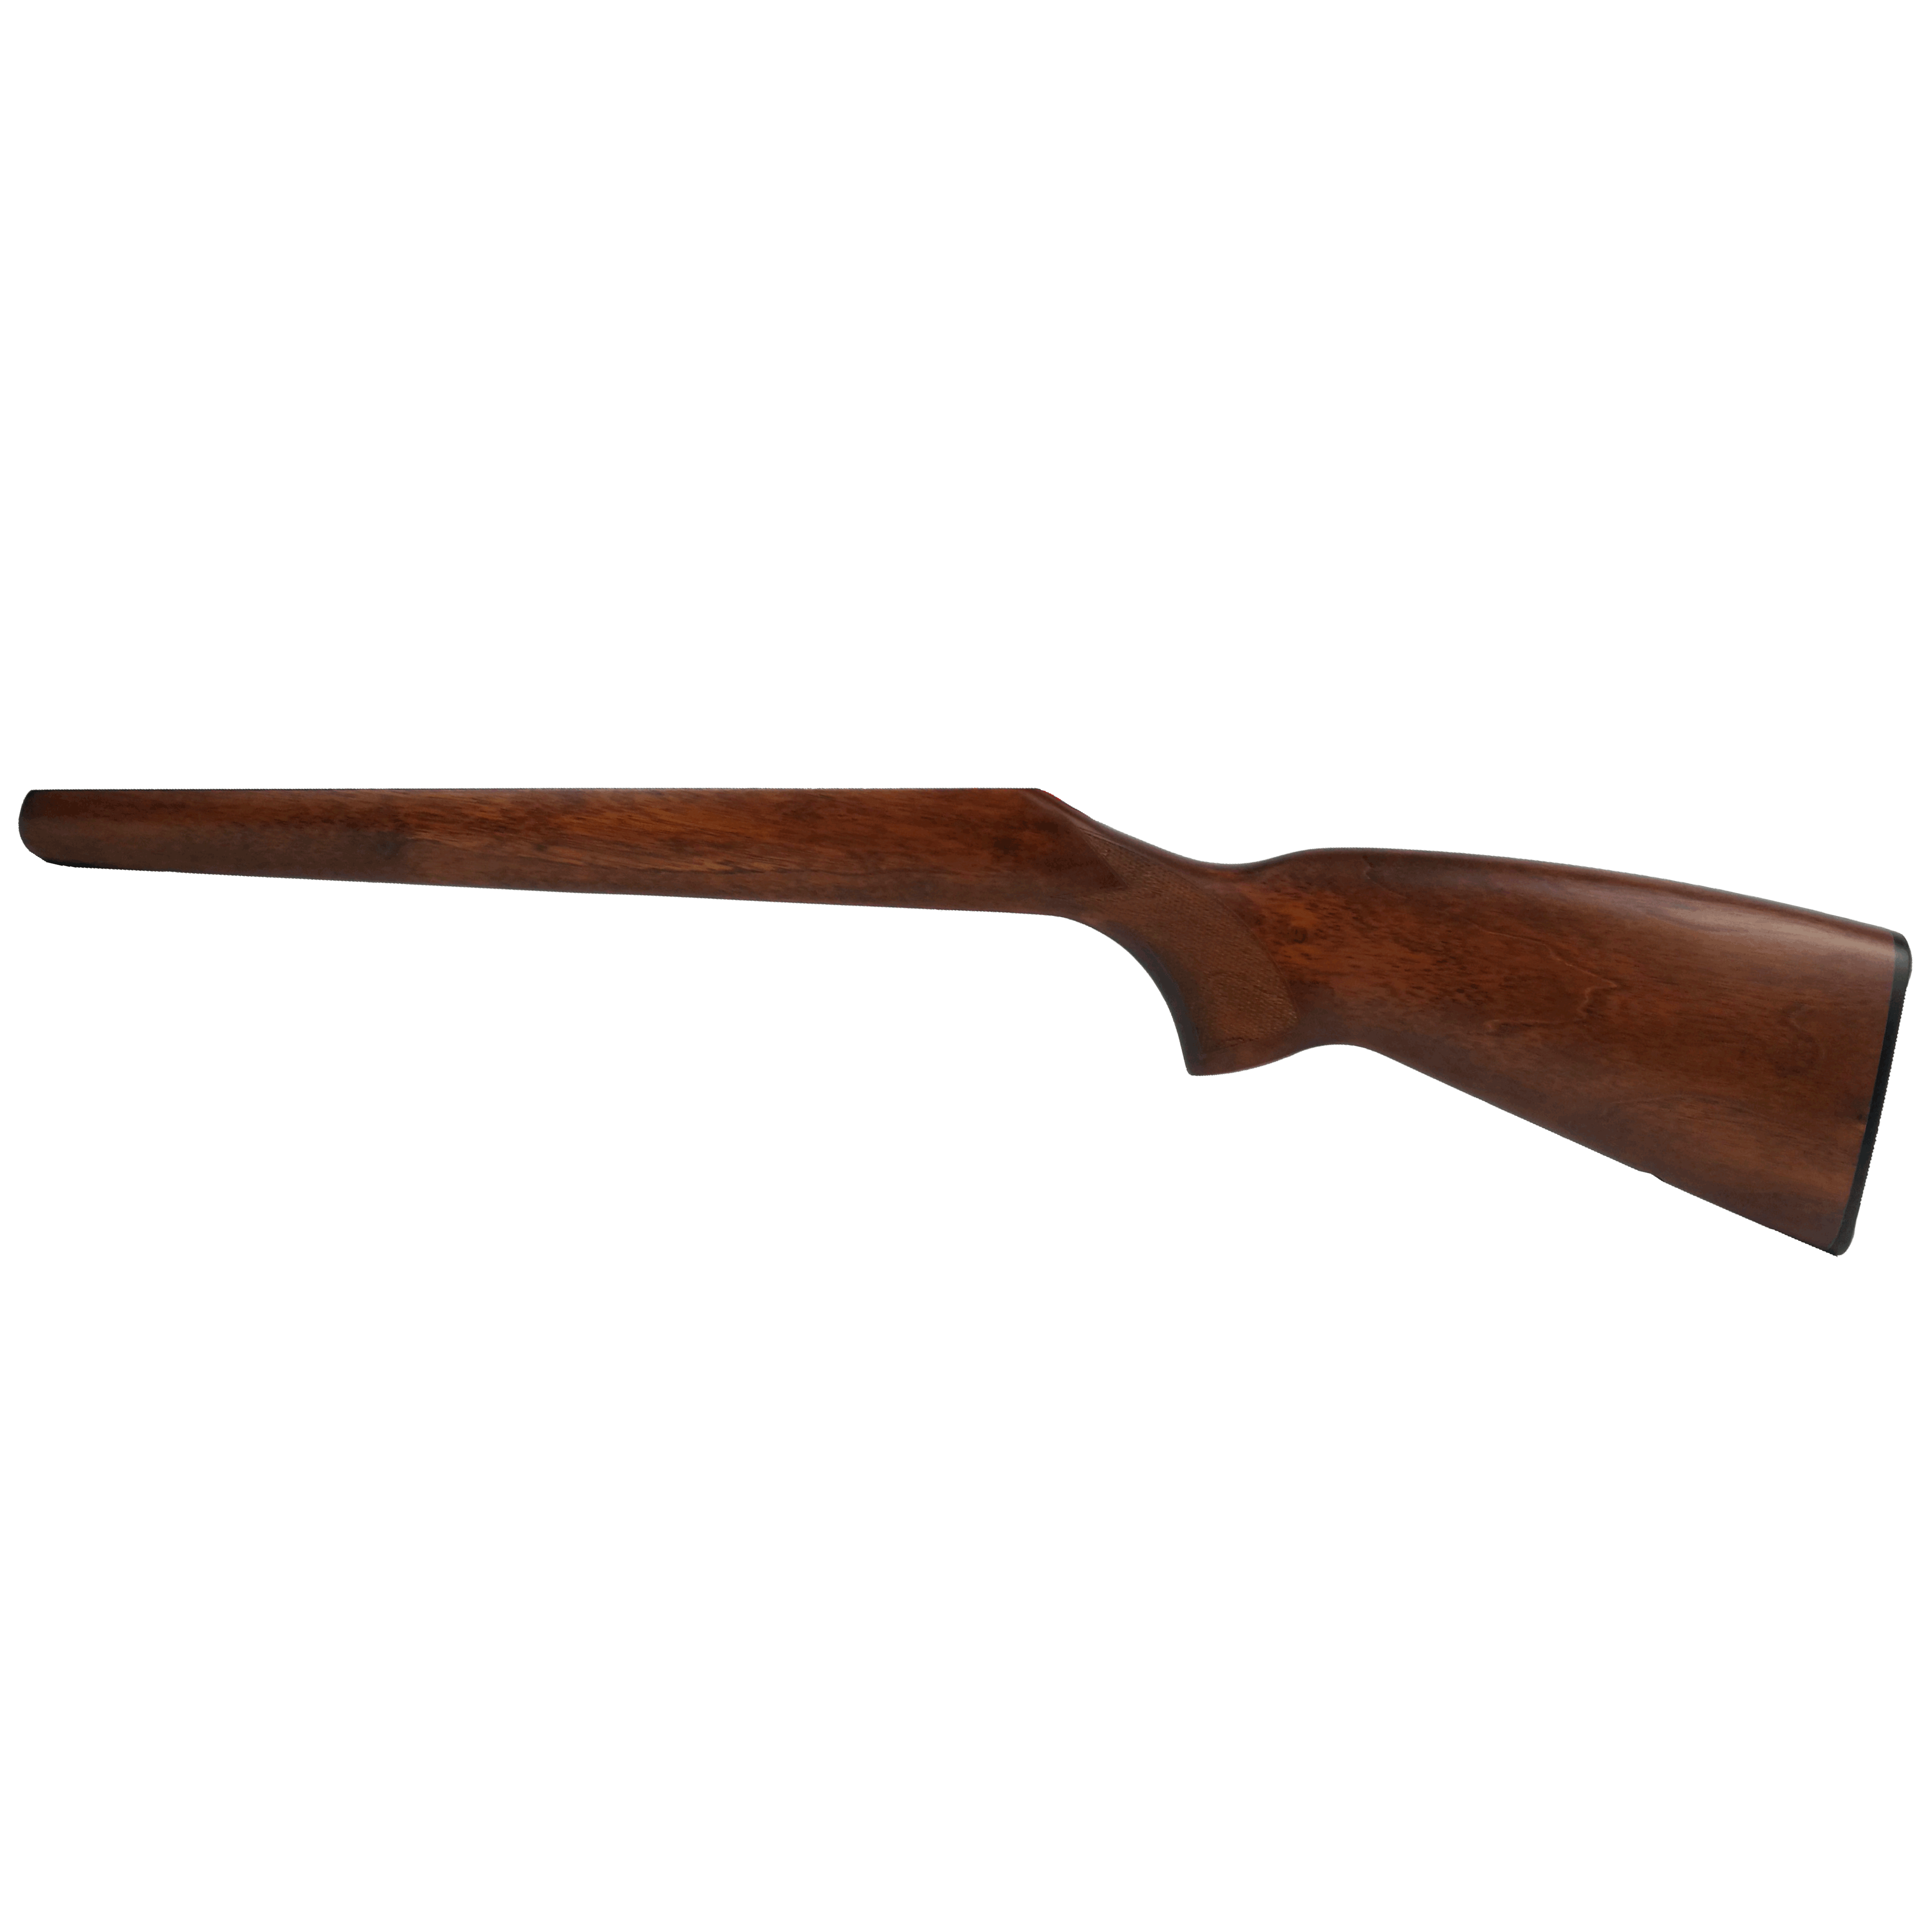 CZ 455 Stock Deluxe PN44